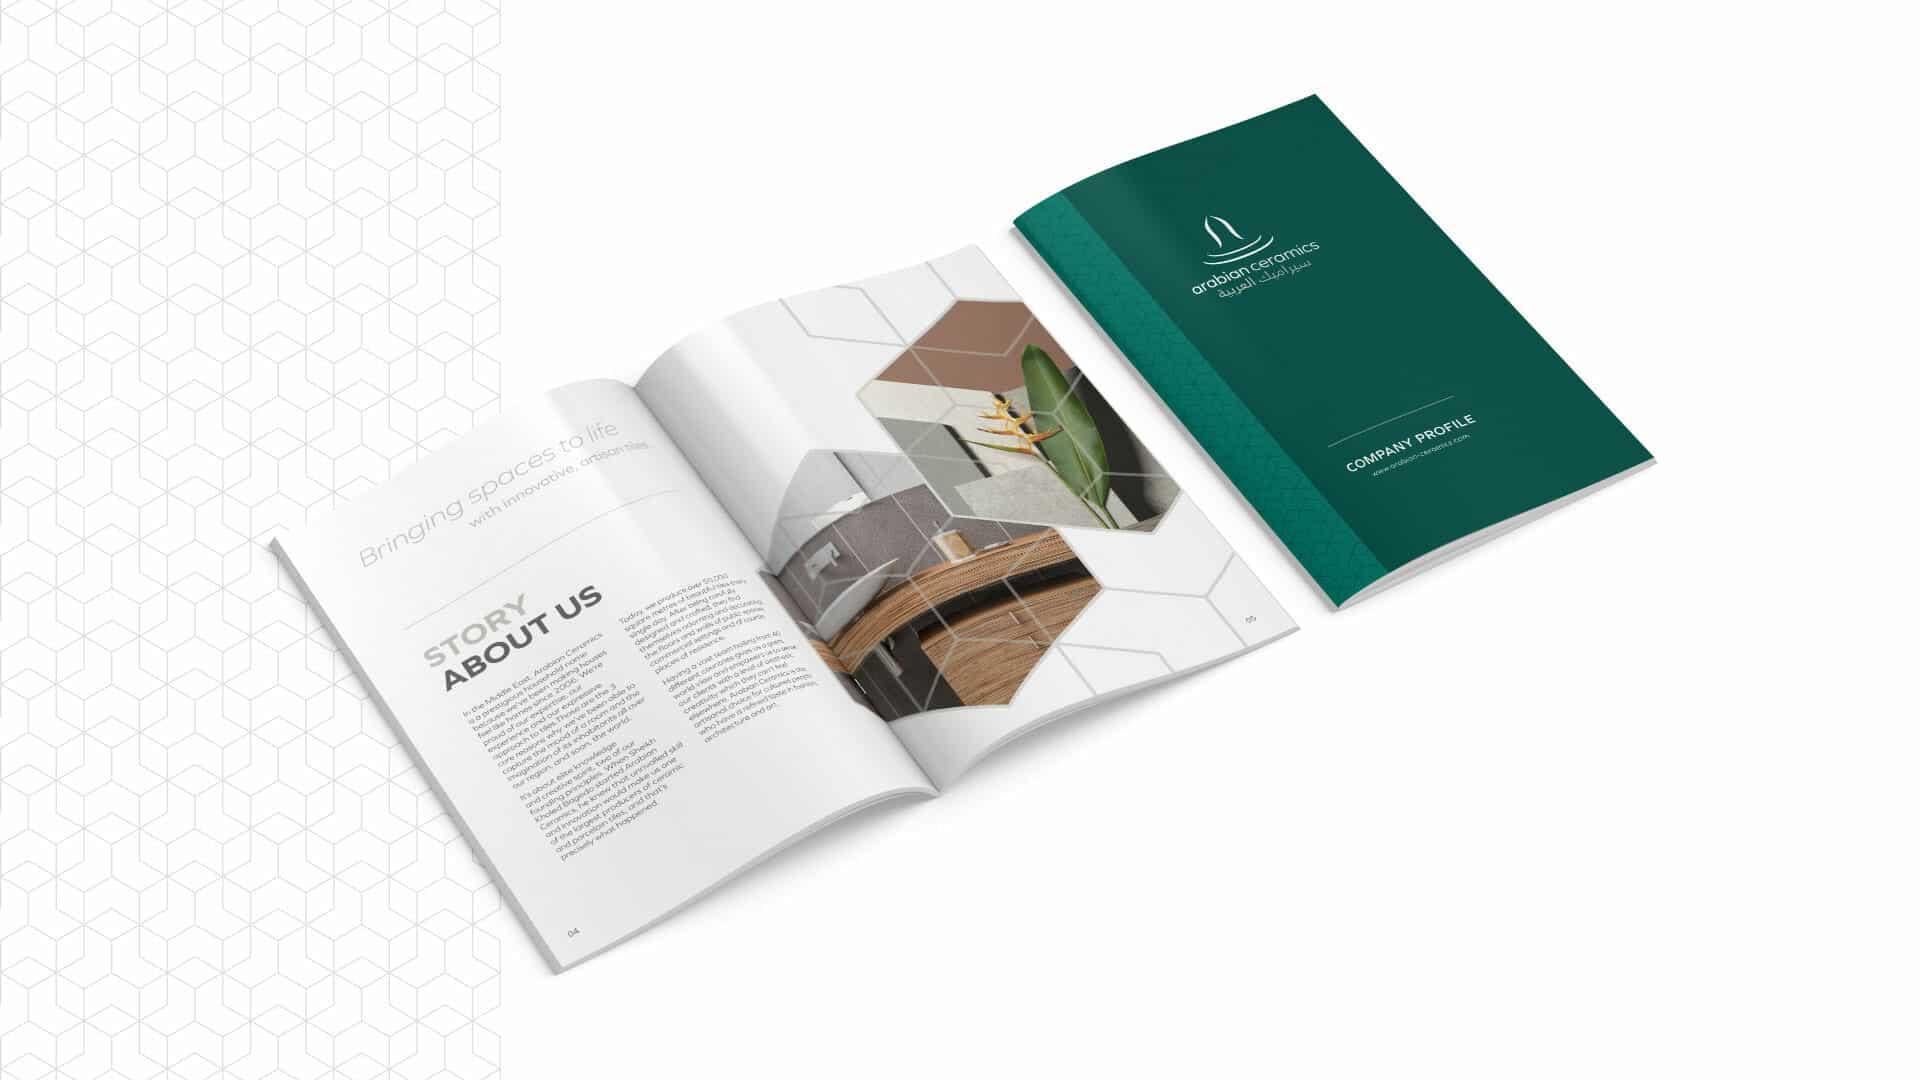 Brochure design for Arabian Ceramics based in Saudia Arabia